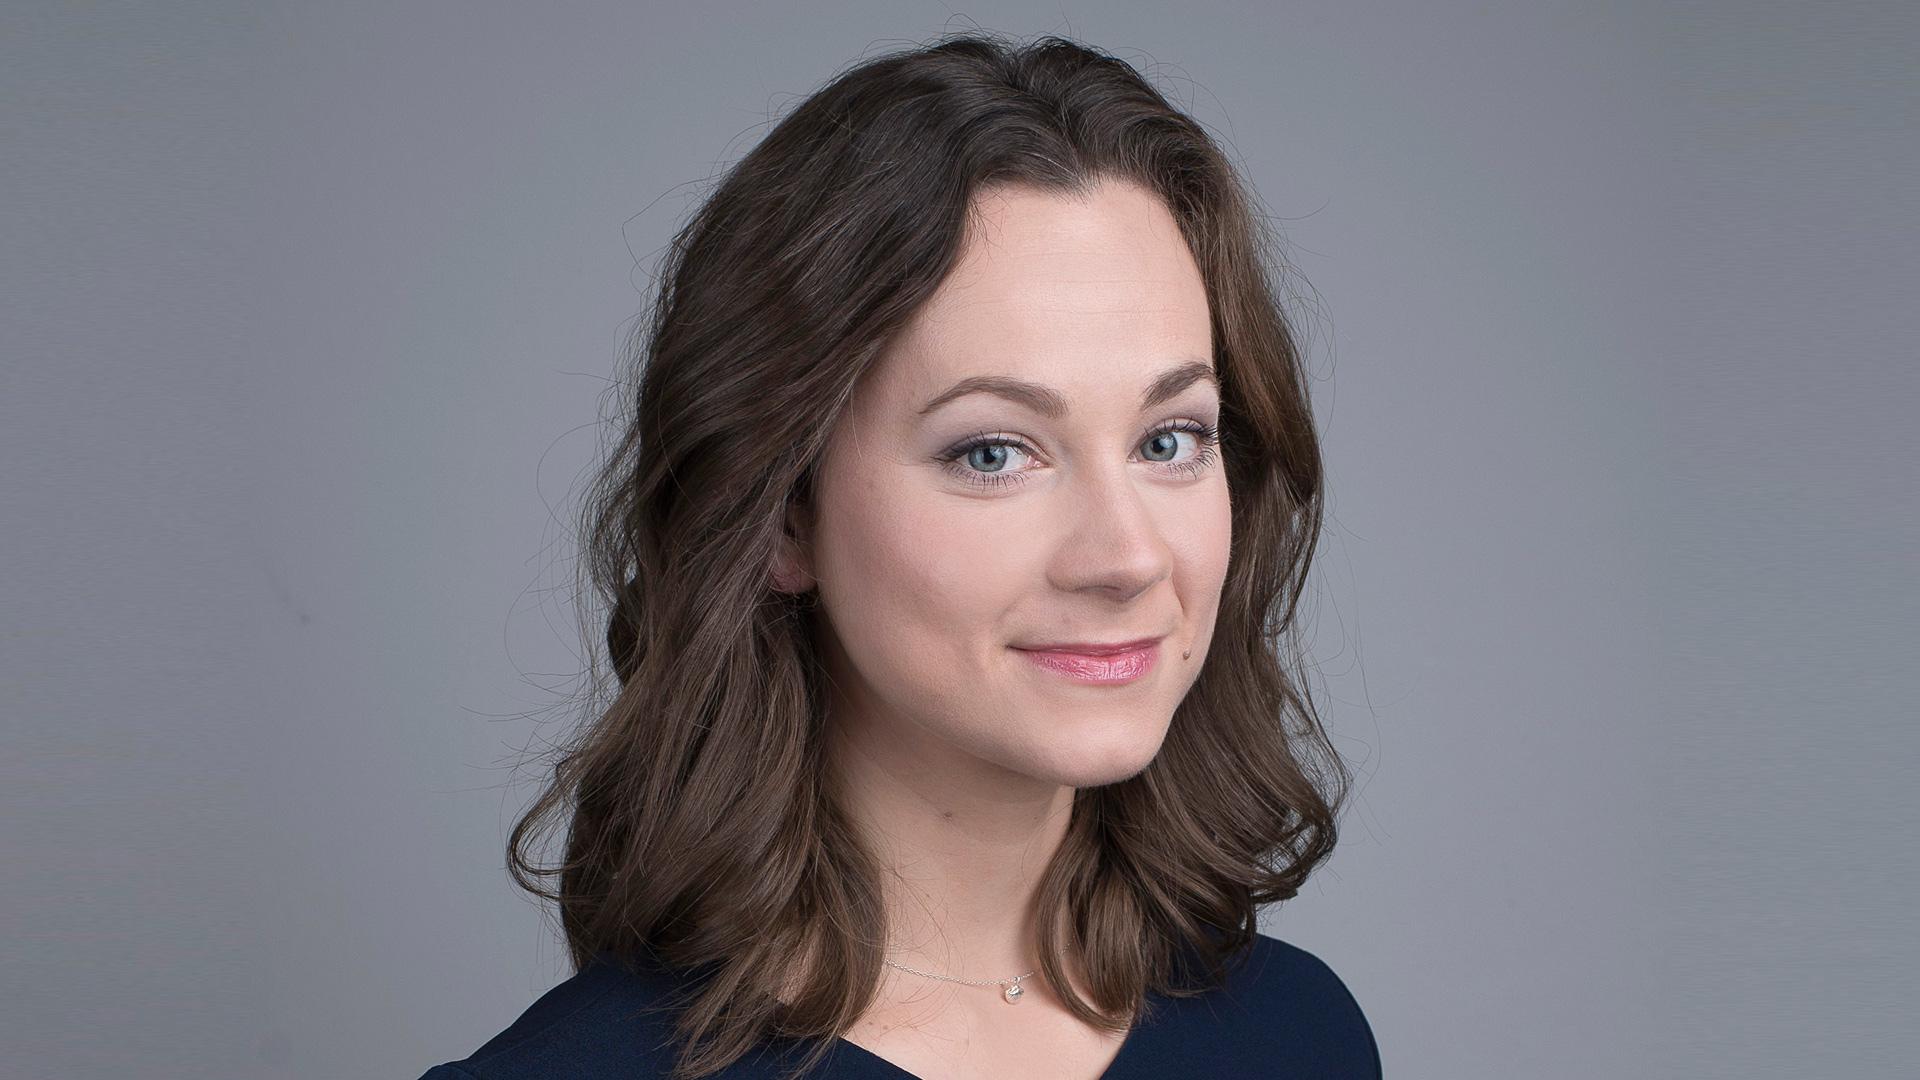 Tina Kessler Sturm Der Liebe Wiki Fandom Powered By Wikia